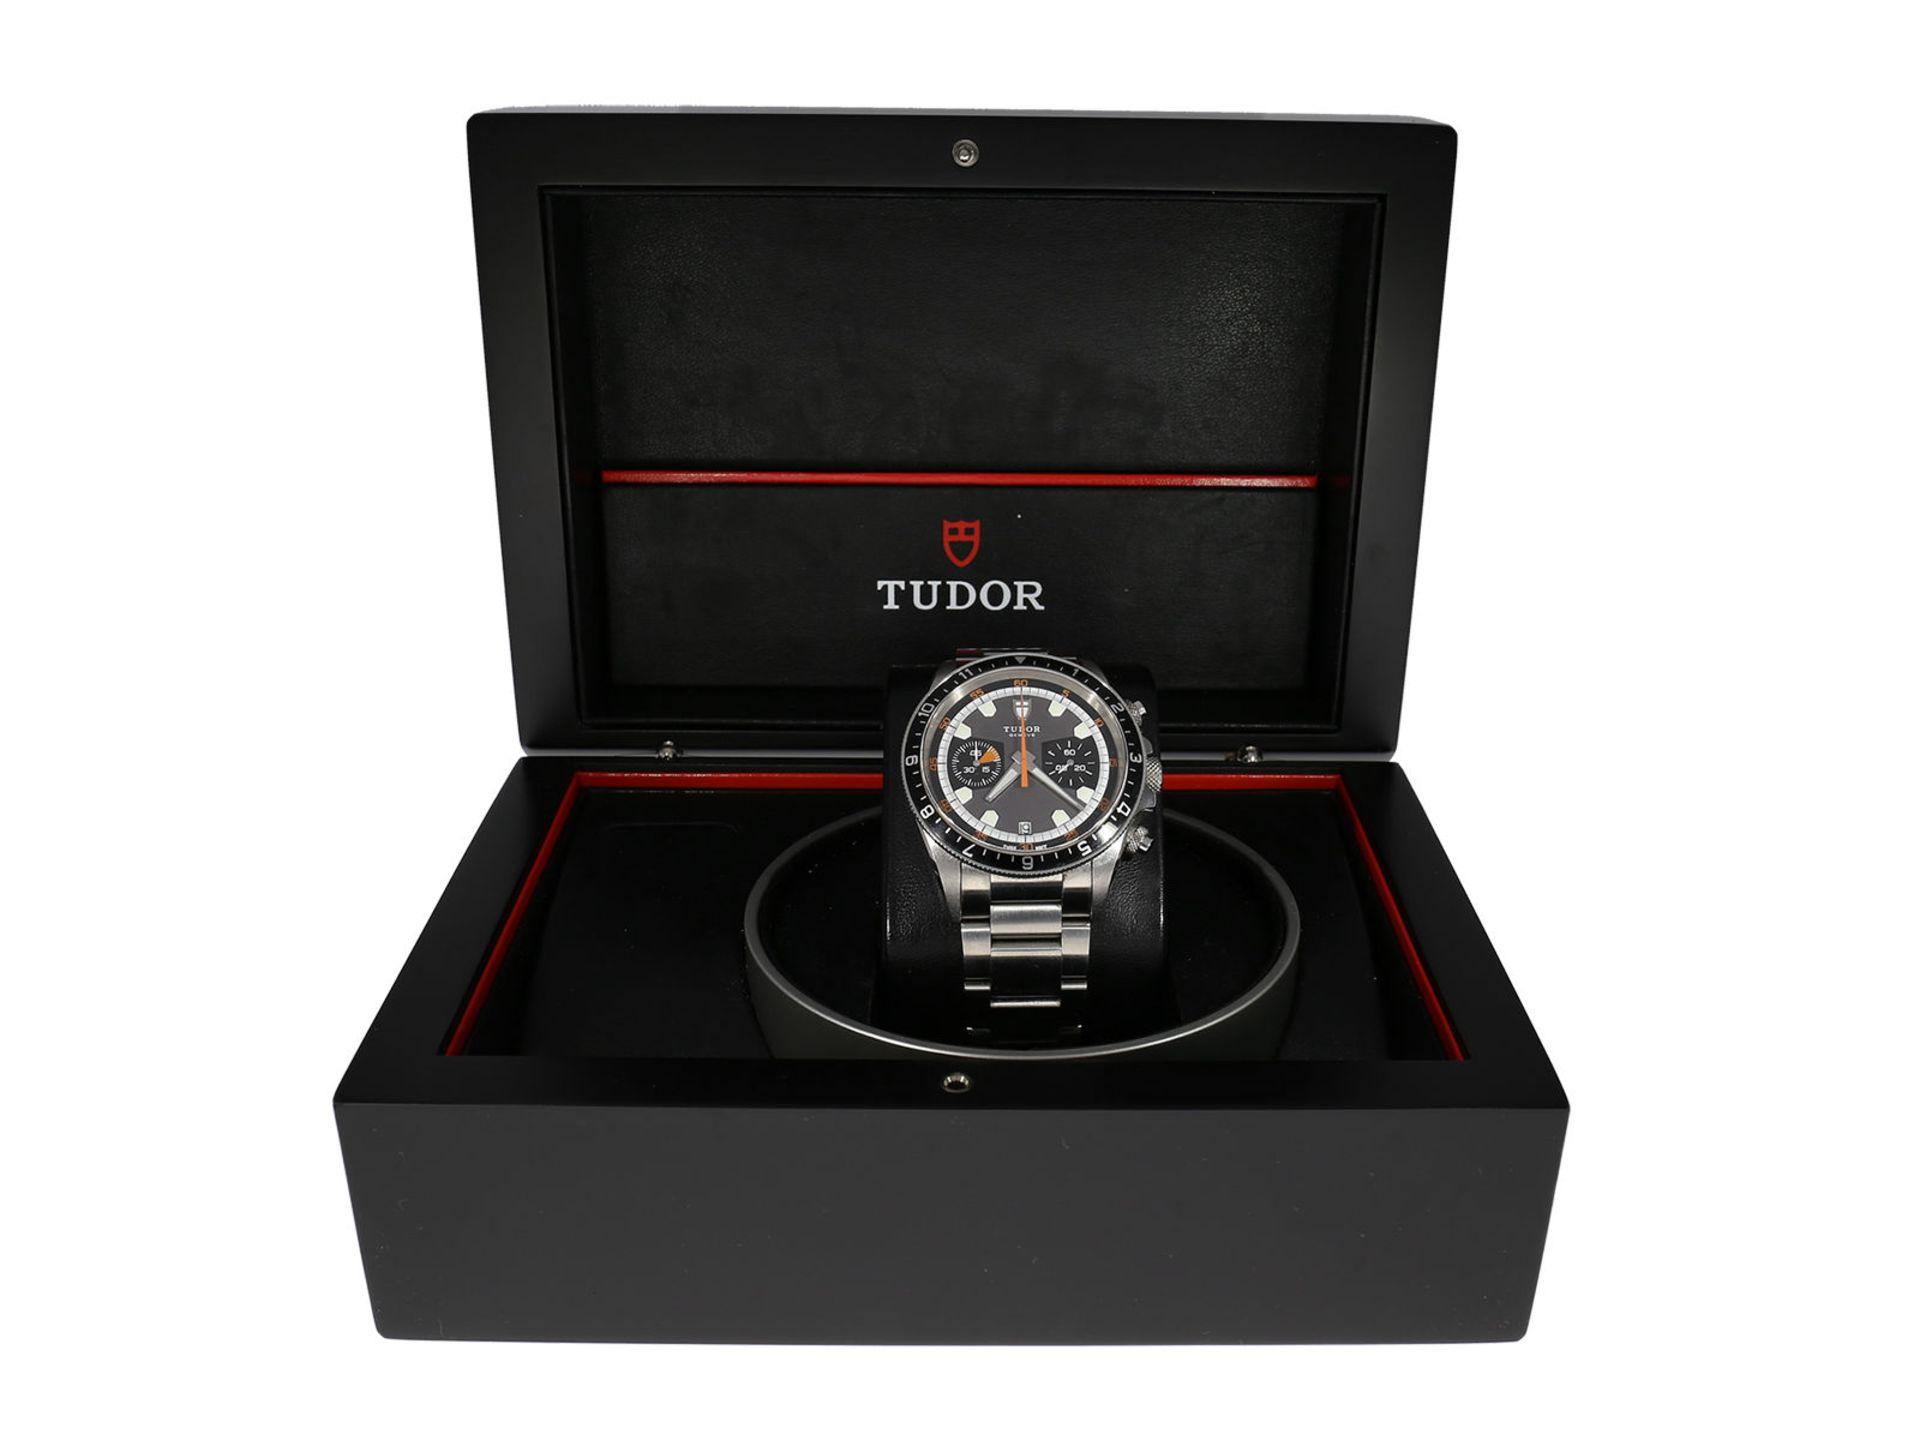 "Wristwatch: sporty and very attractive man's chronograph, Tudor ""Black Bay Heritage"" Ref. 70330N, - Bild 2 aus 6"